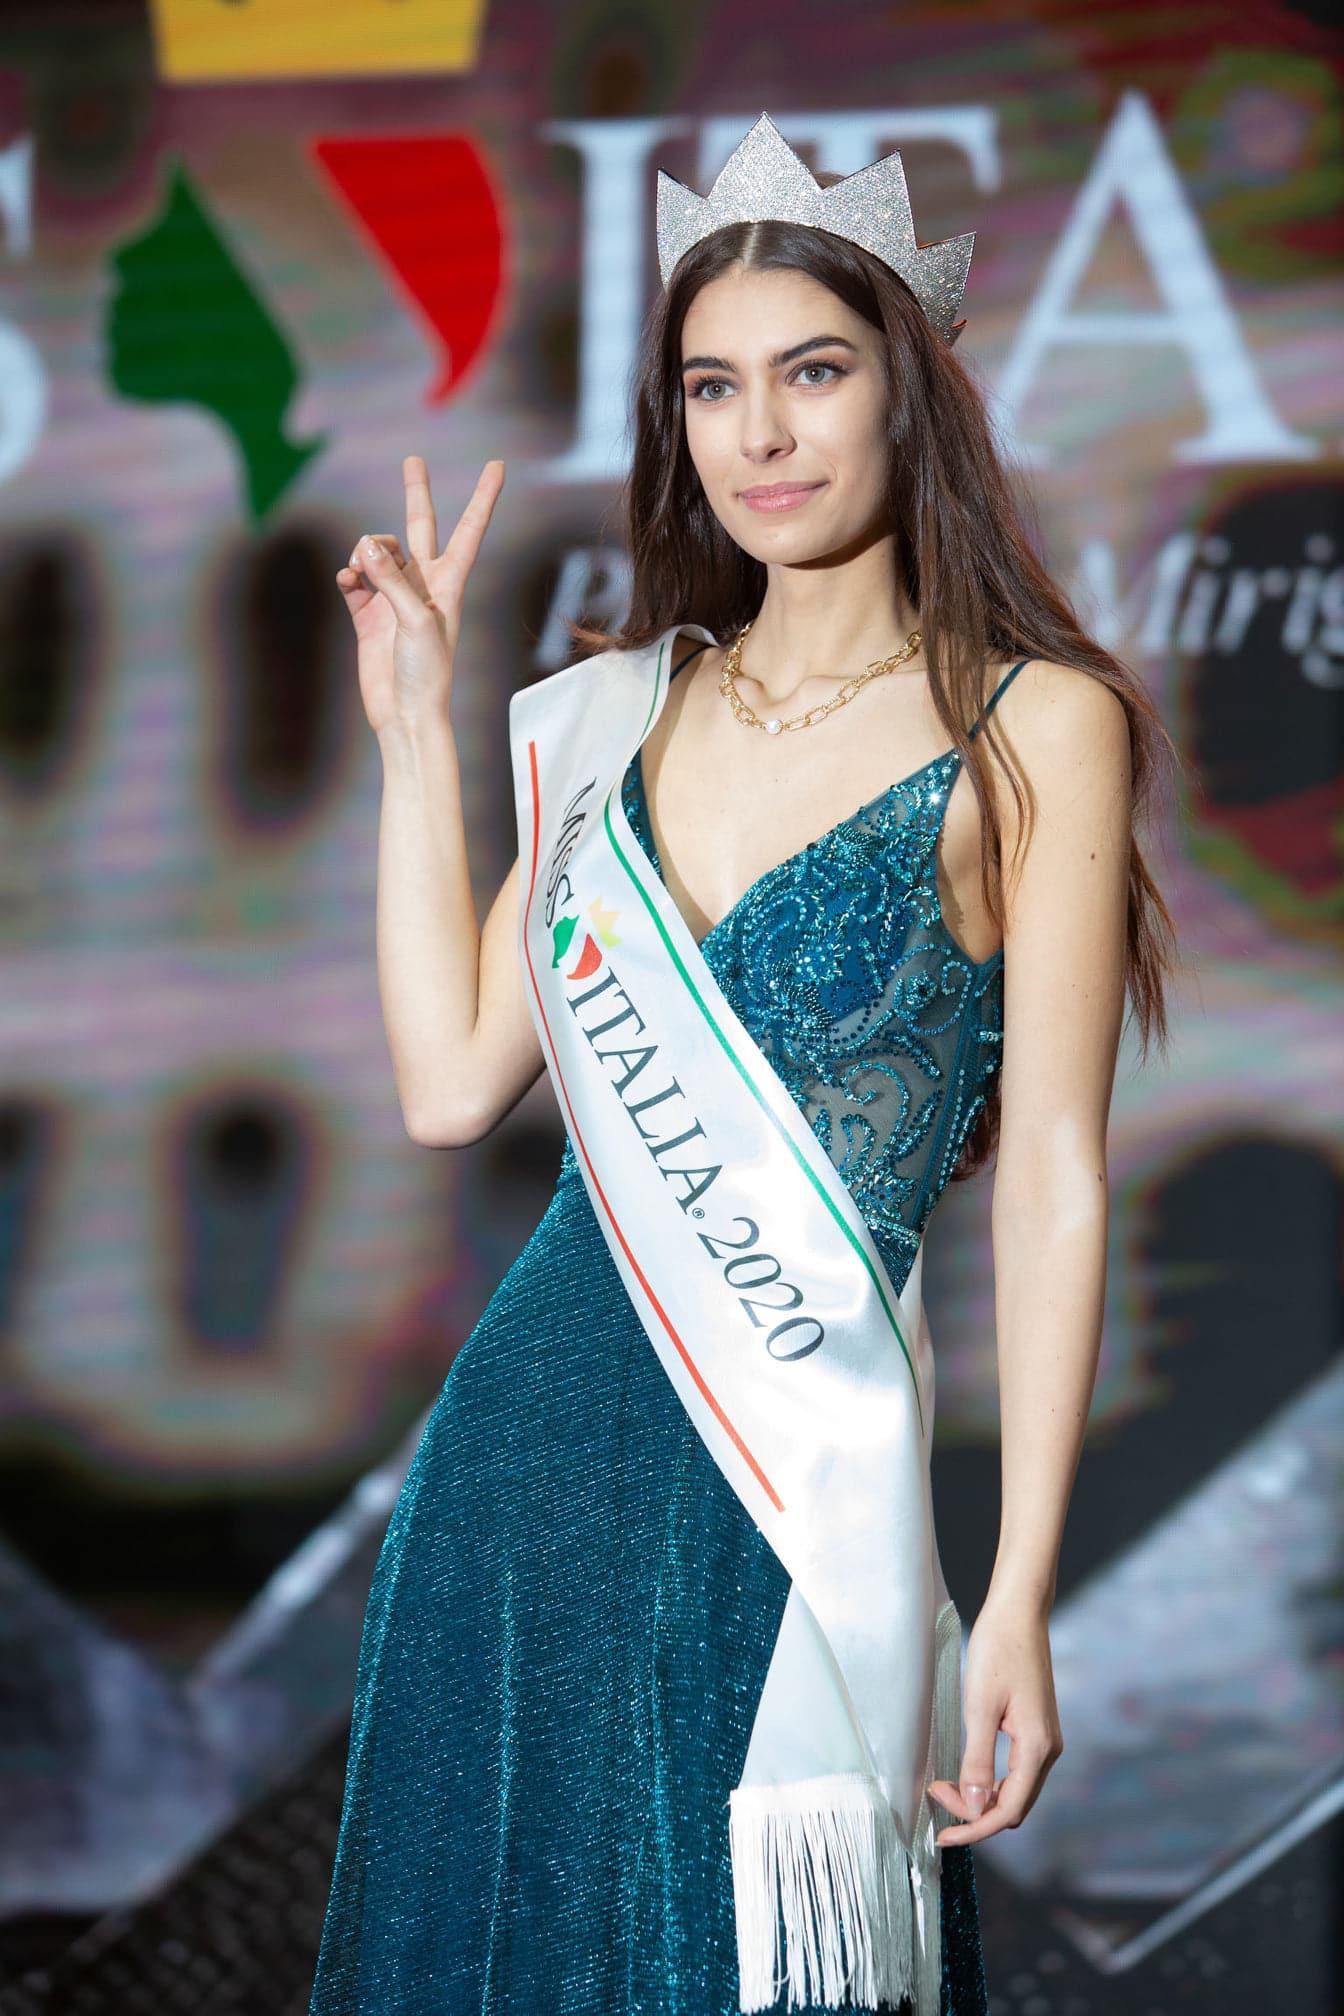 chi è martina sambucini miss italia 2020